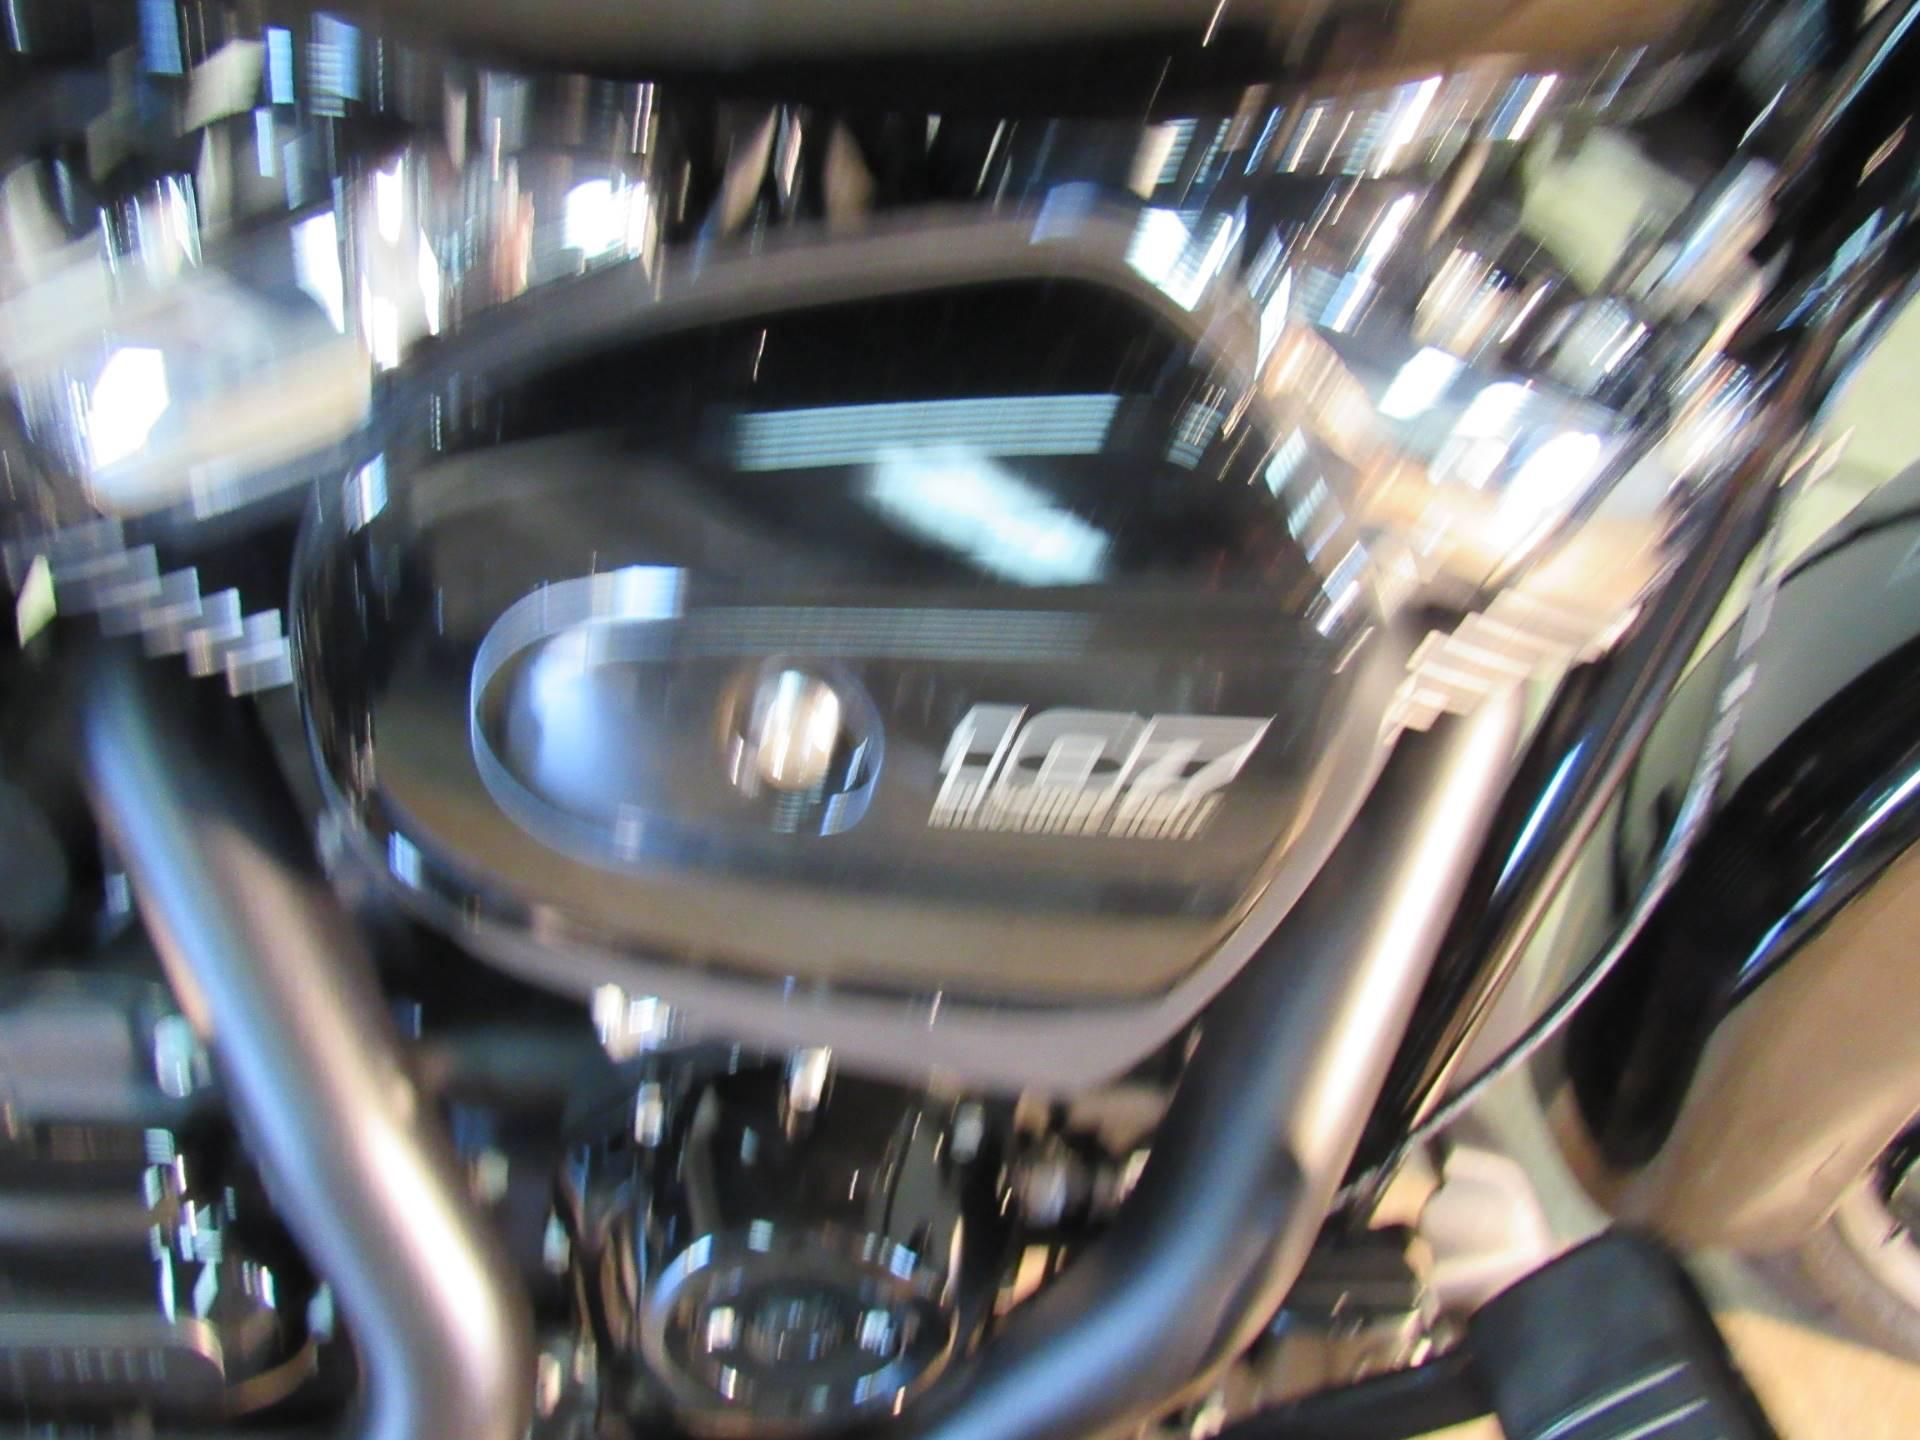 2017 Harley Davidson Road Glide In Temecula California